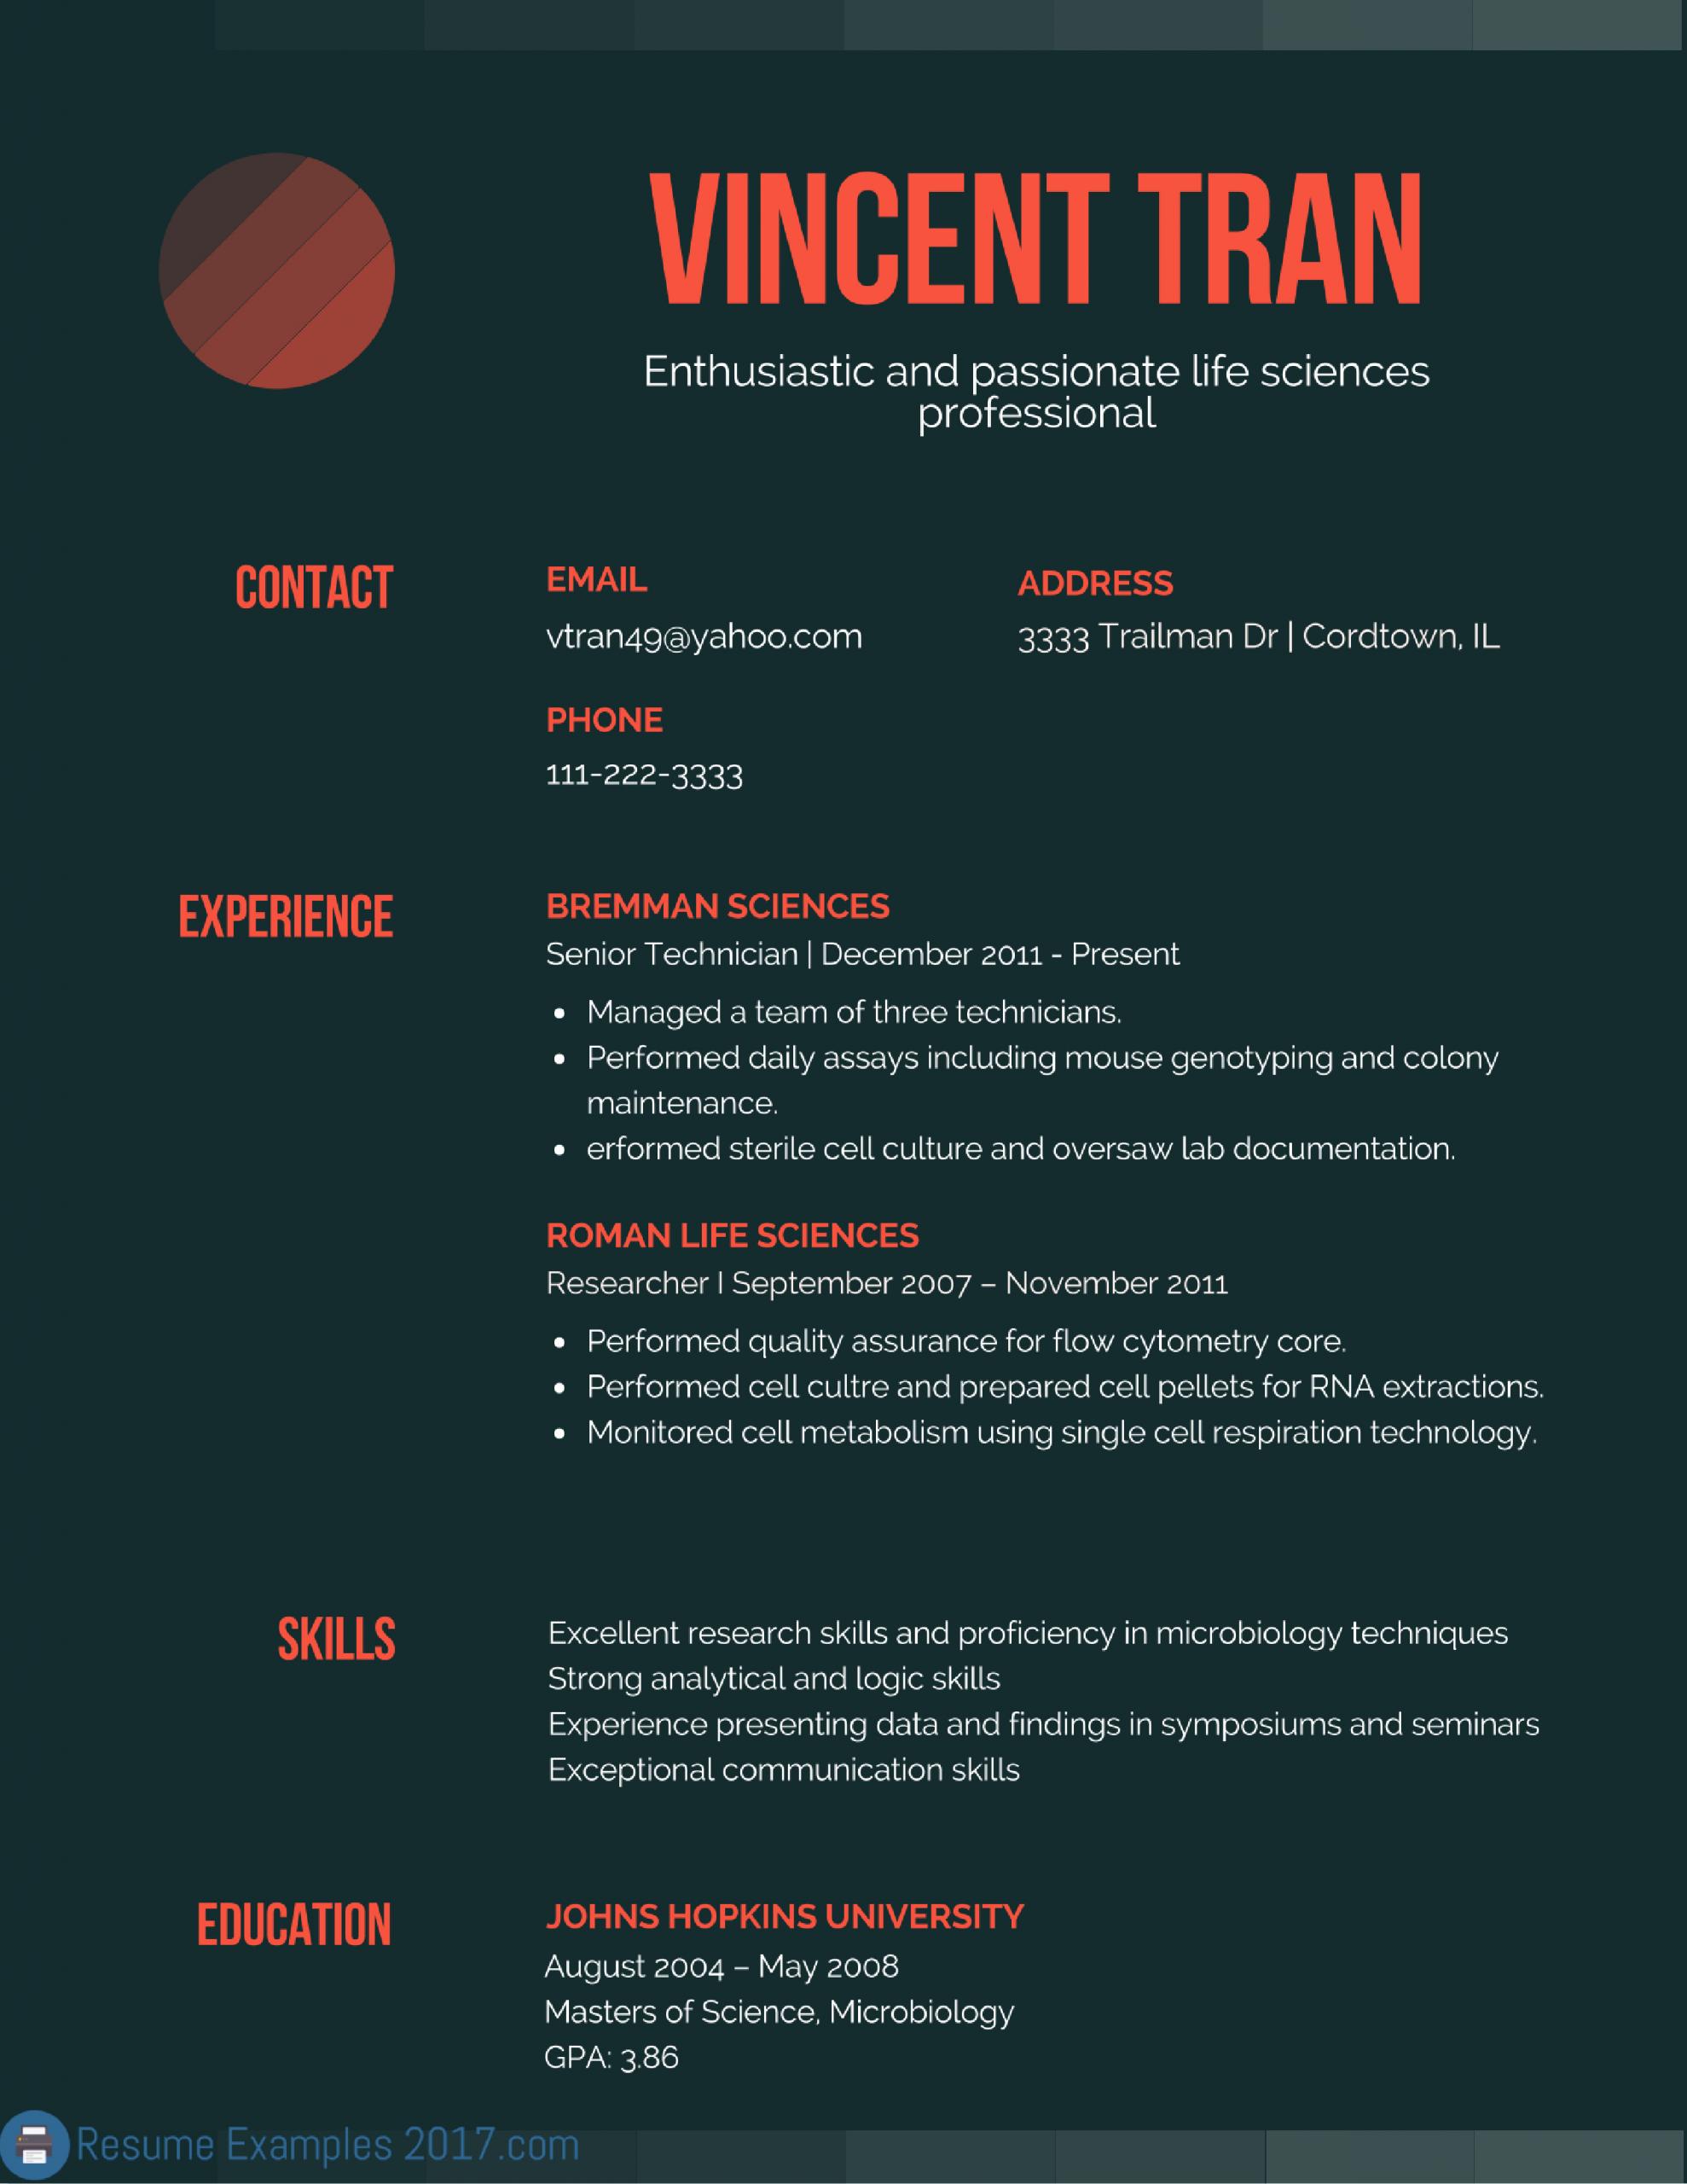 Headline Examples For Resume Beautiful Resume Headline Examples 2019 In 2020 Resume Examples Resume Simple Resume Template